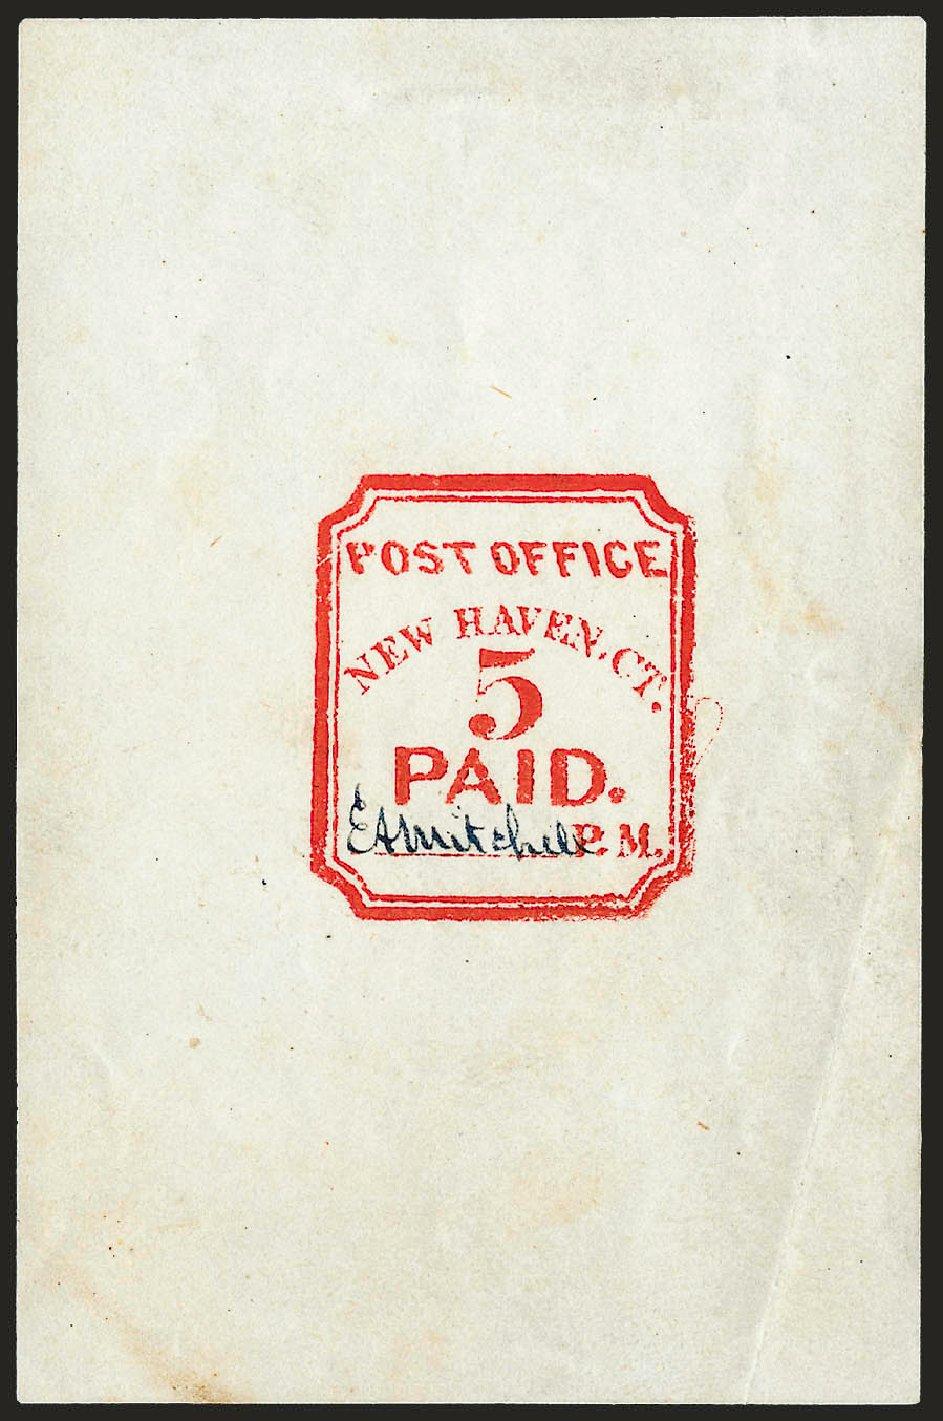 Price of US Stamp Scott 8XU1 - 5c 1845 New Haven Postmasters Provisional. Robert Siegel Auction Galleries, Dec 2008, Sale 964, Lot 12